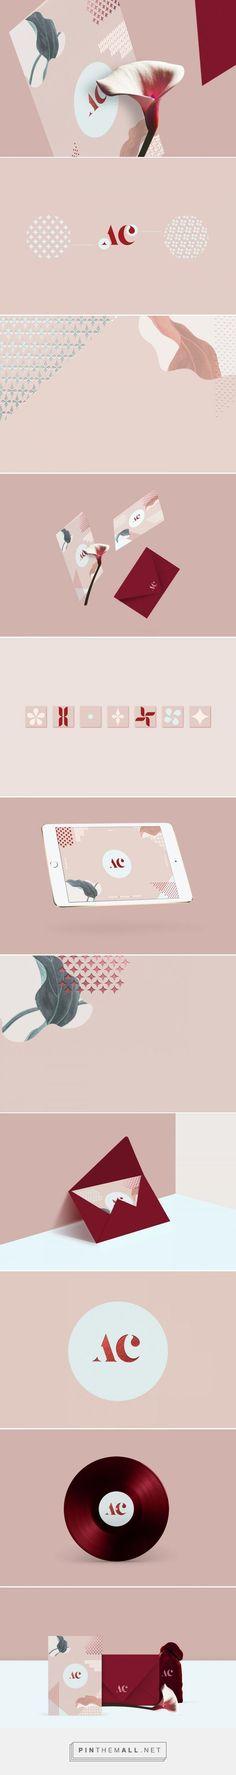 AC Branding by Maria Hdez on Behance   Fivestar Branding – Design and Branding Agency & Inspiration Gallery